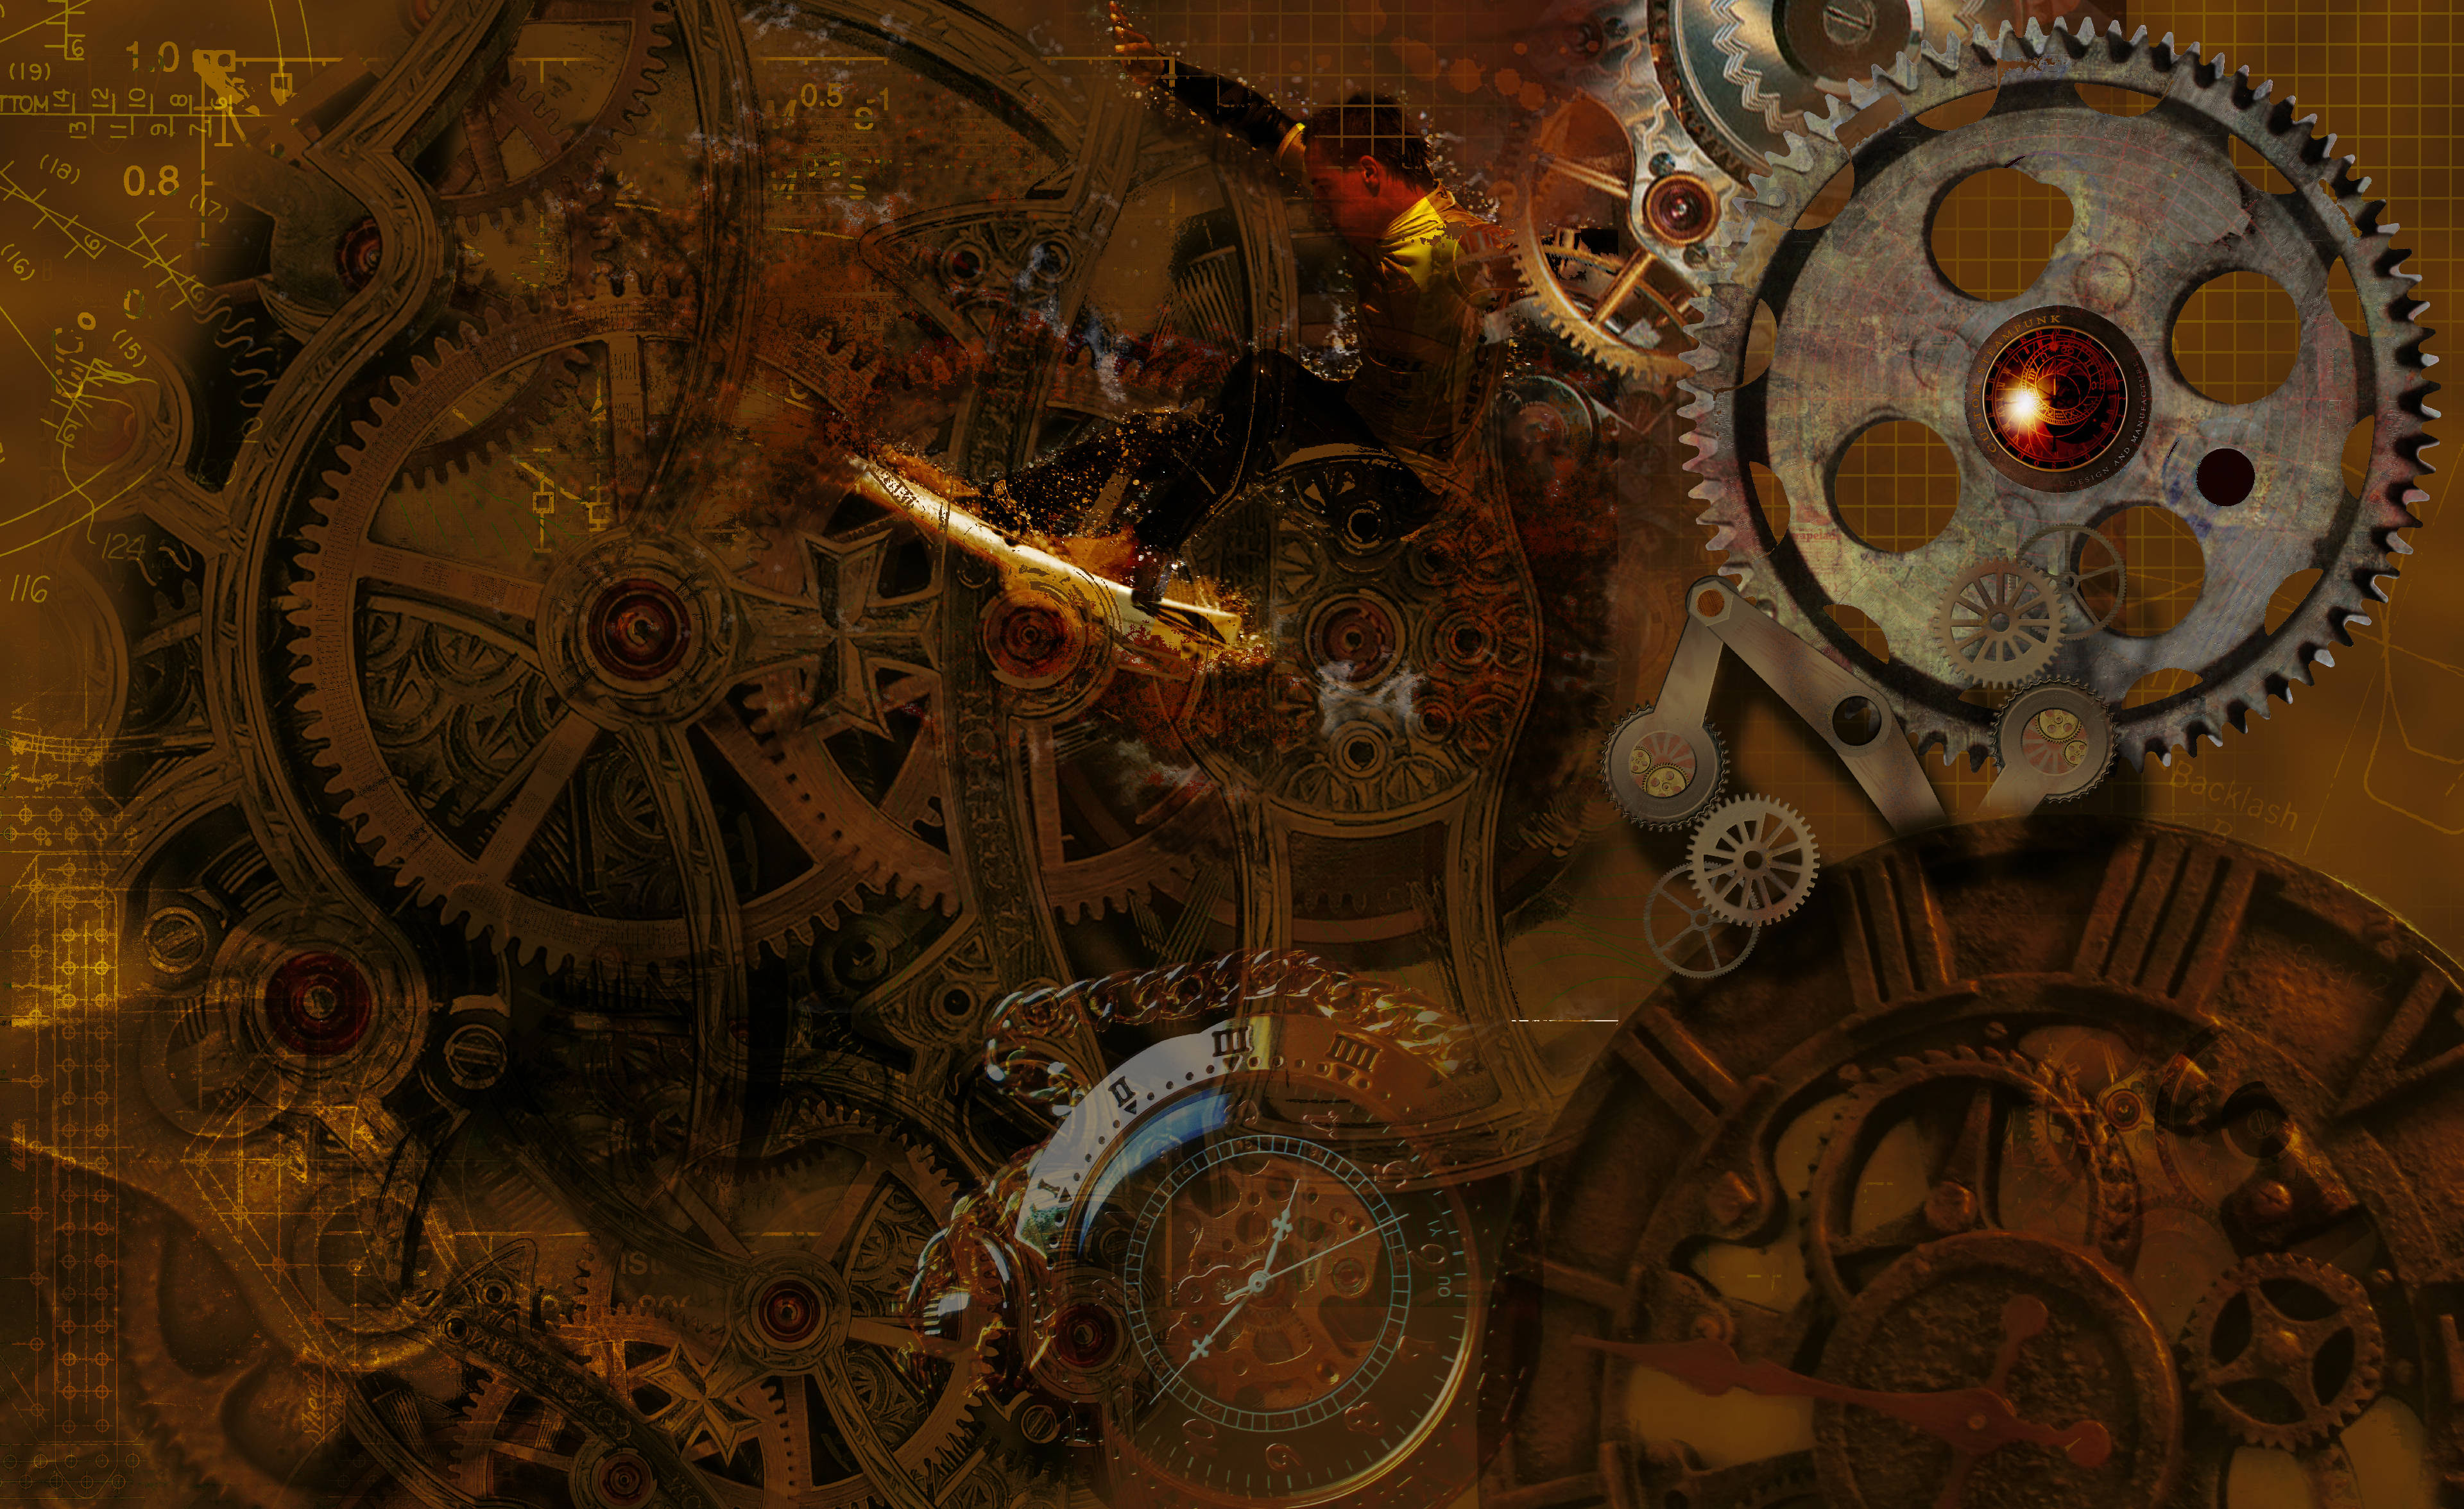 steampunkwp 3840 2352 wallpaper 3840x2352